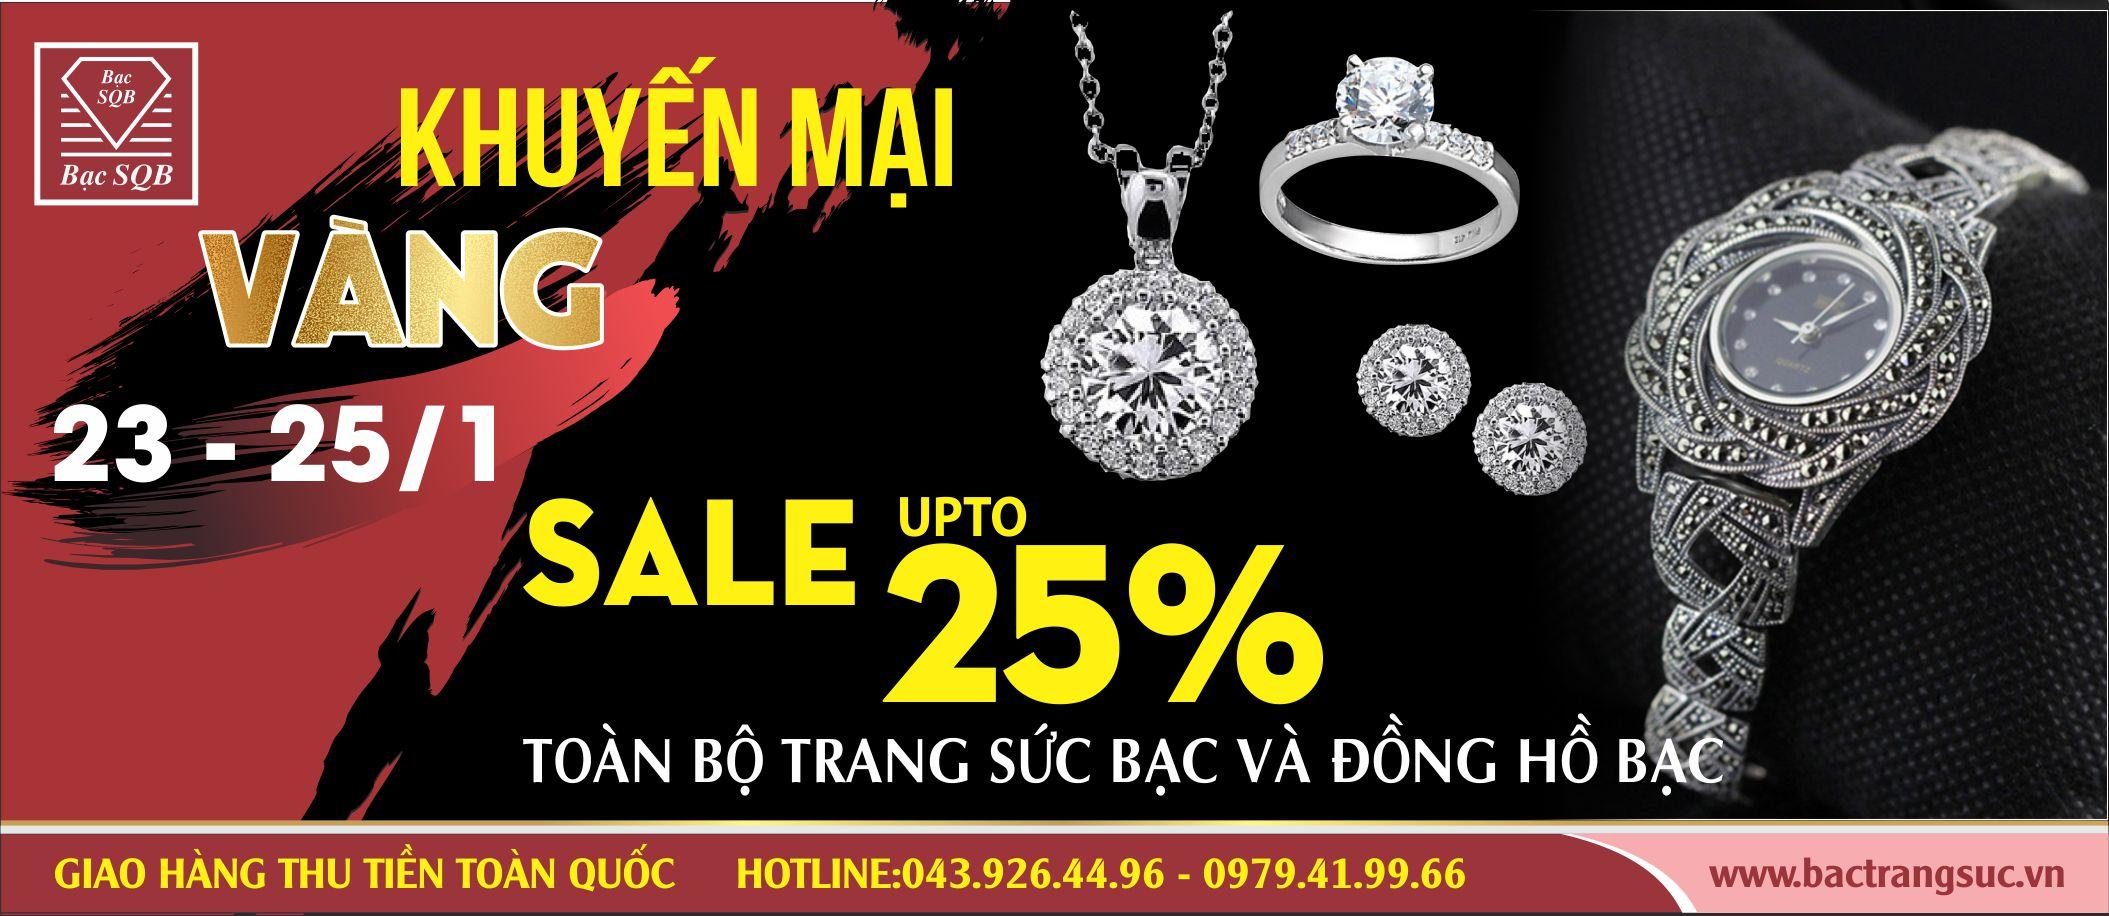 Slide Trang sức bạc